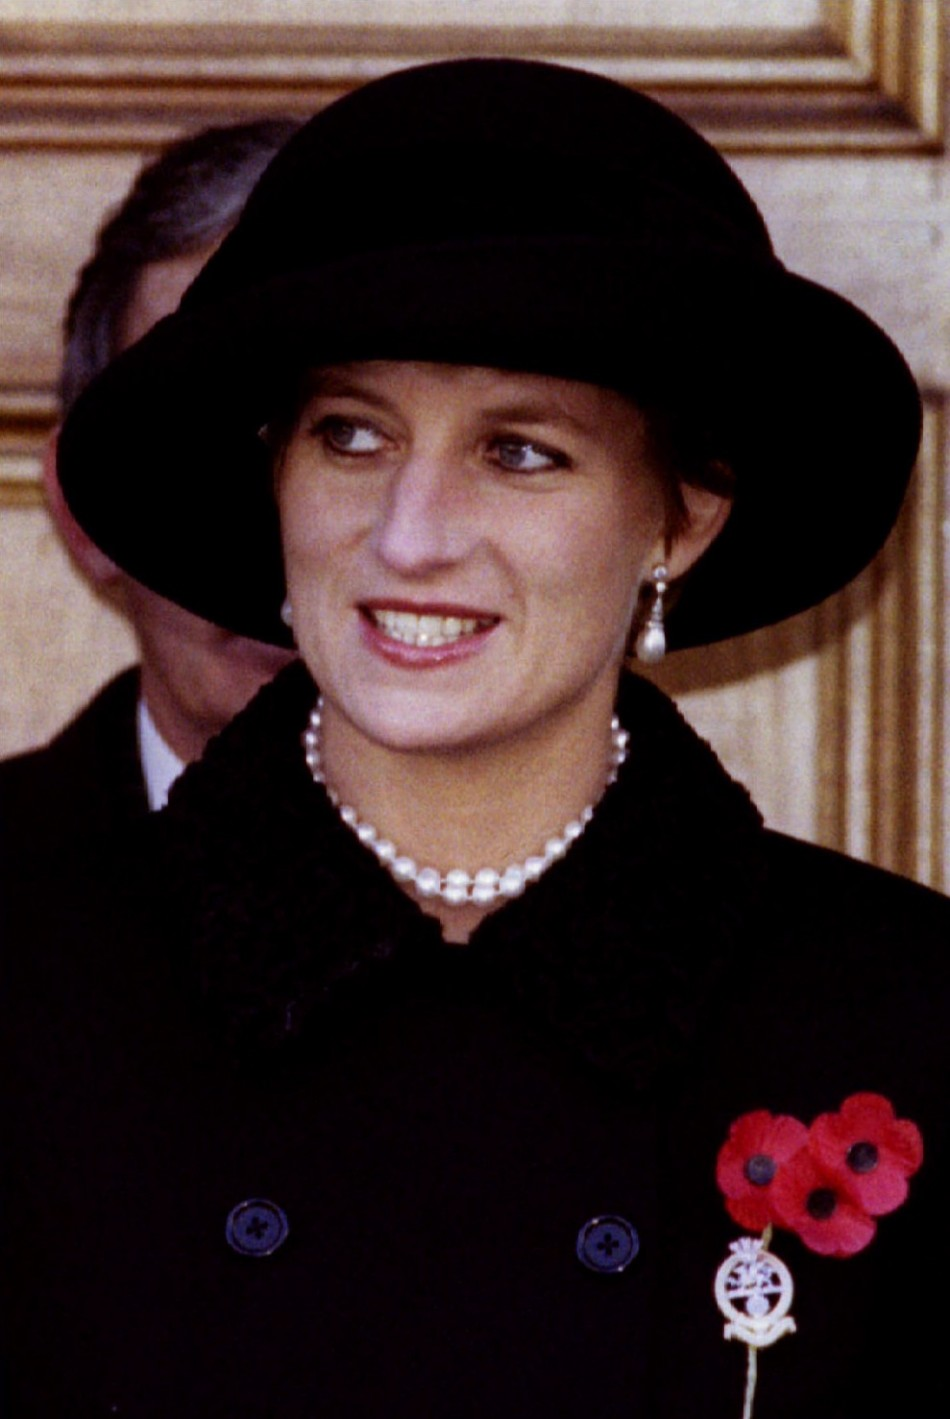 Princess Diana, Kate Moss and TIMEs 100 Fashion Icons